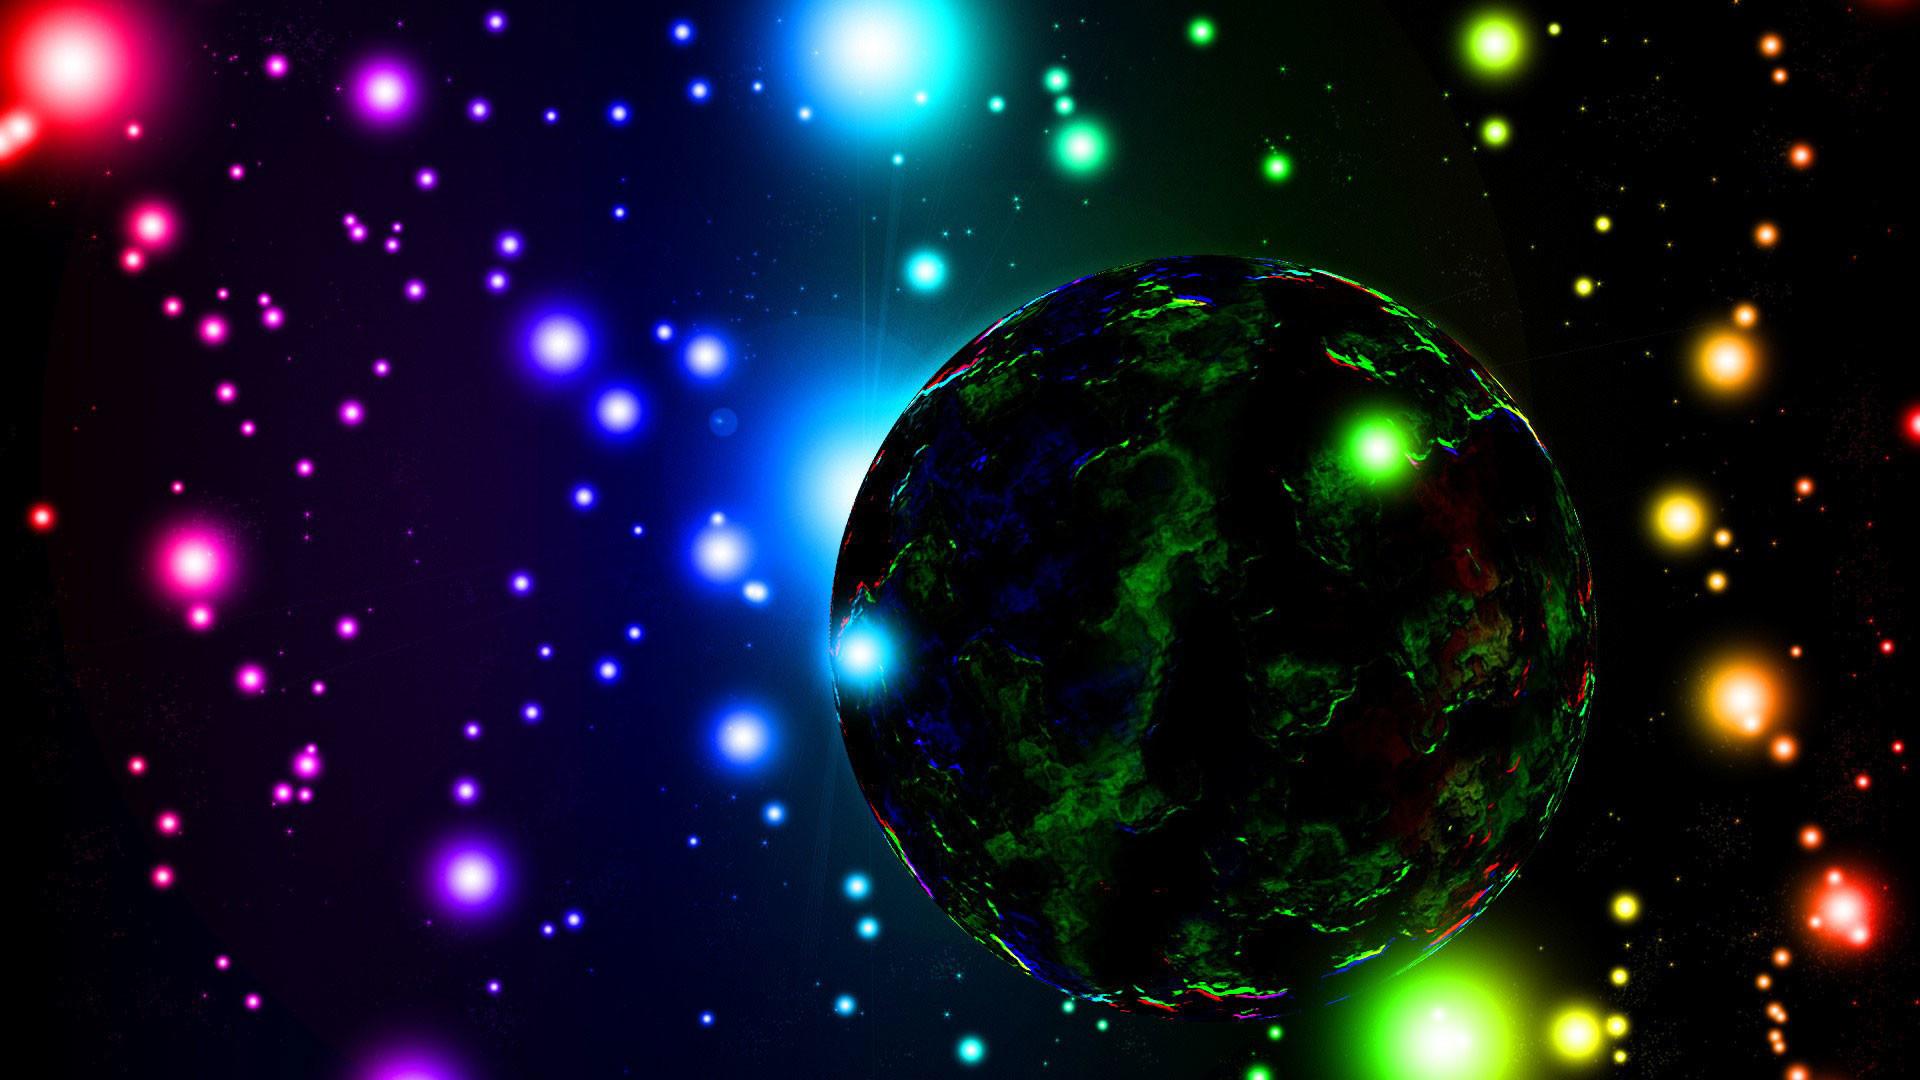 hd pics photos neon space planet hd best desktop background wallpaper